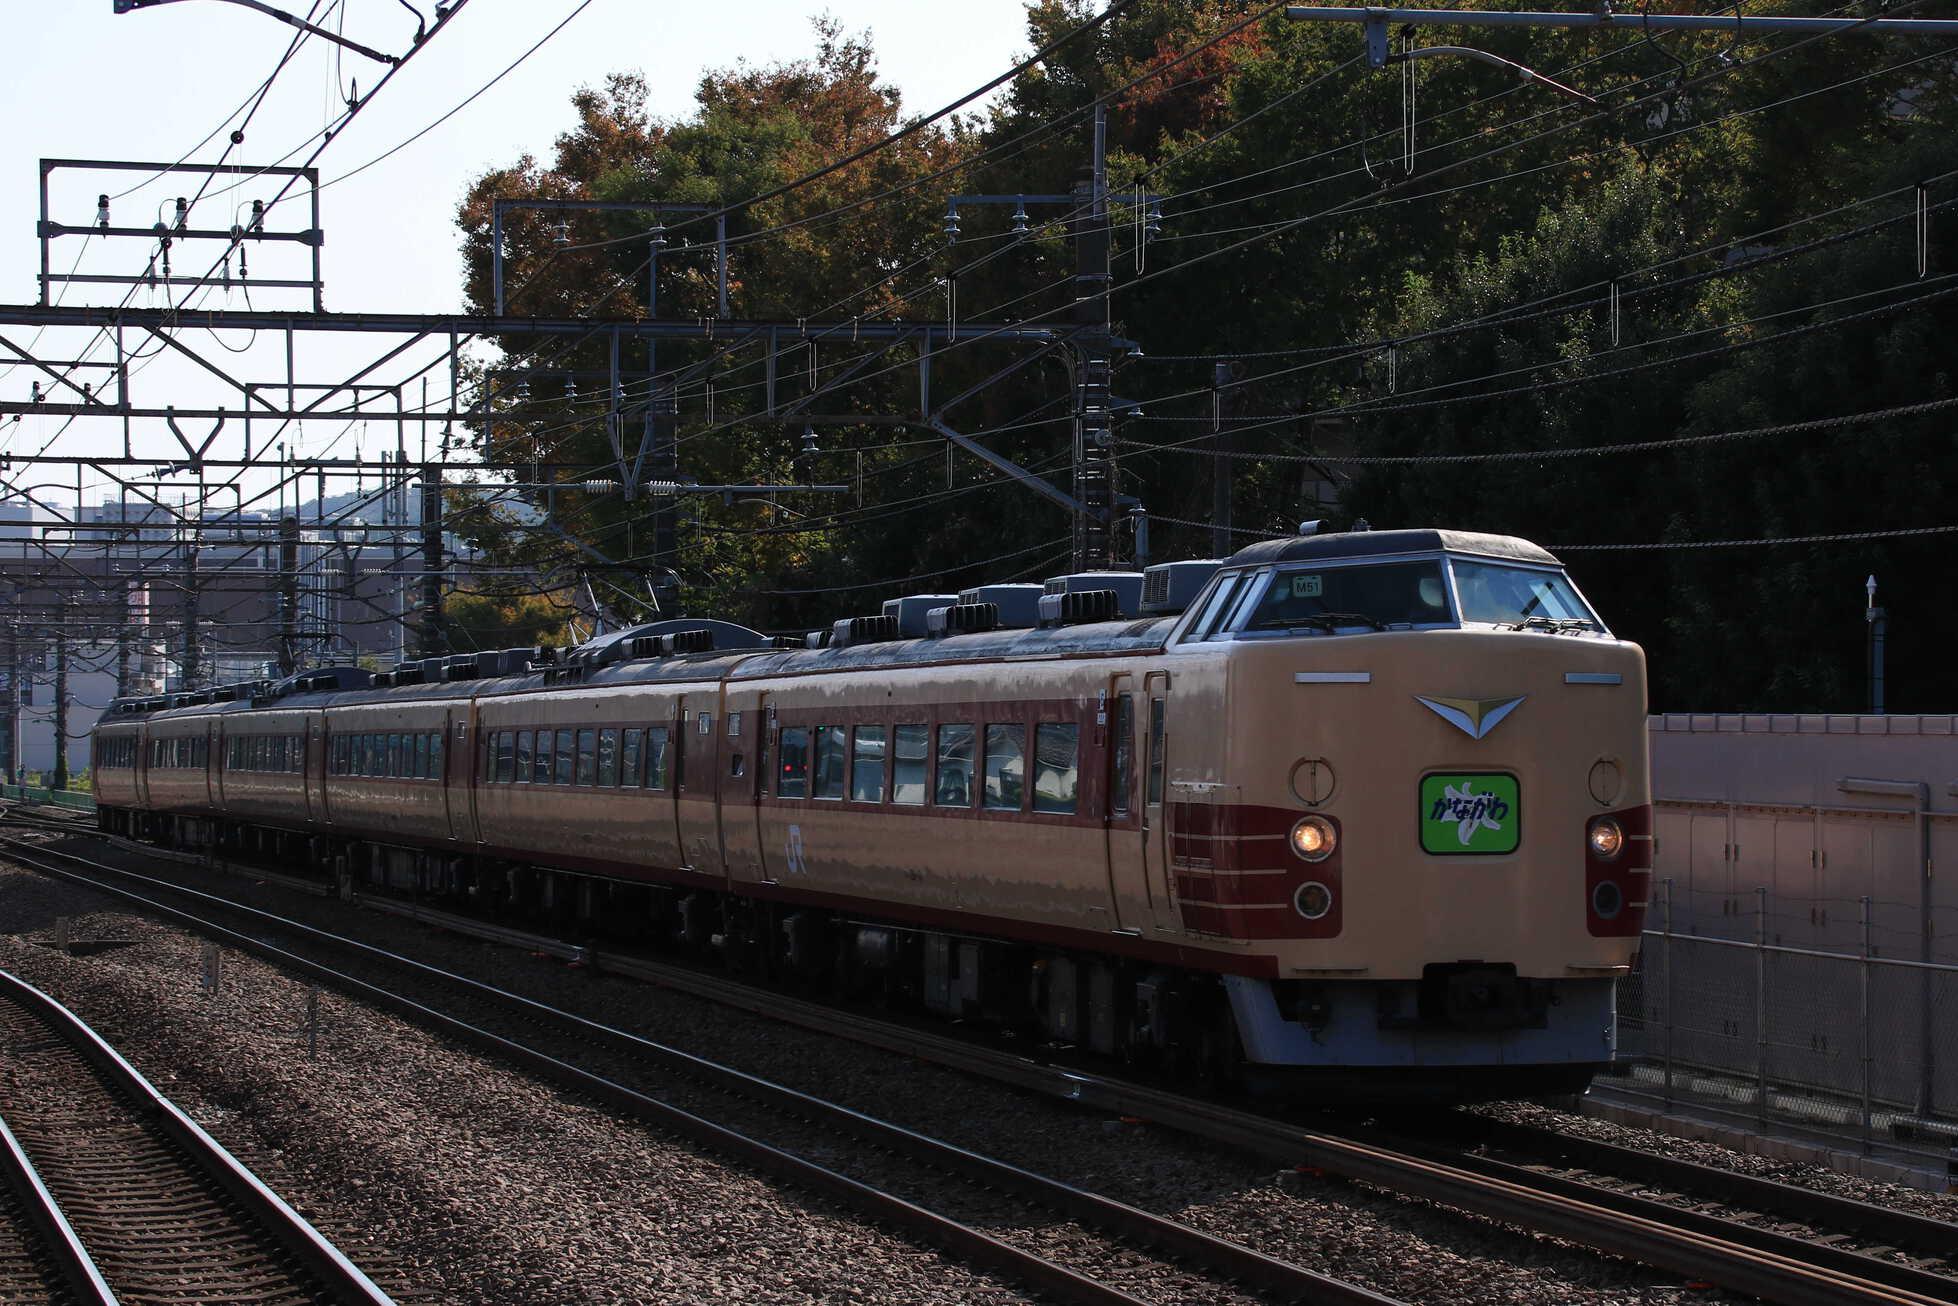 9822M 団臨 神奈川満喫号 189系 八トタM51編成